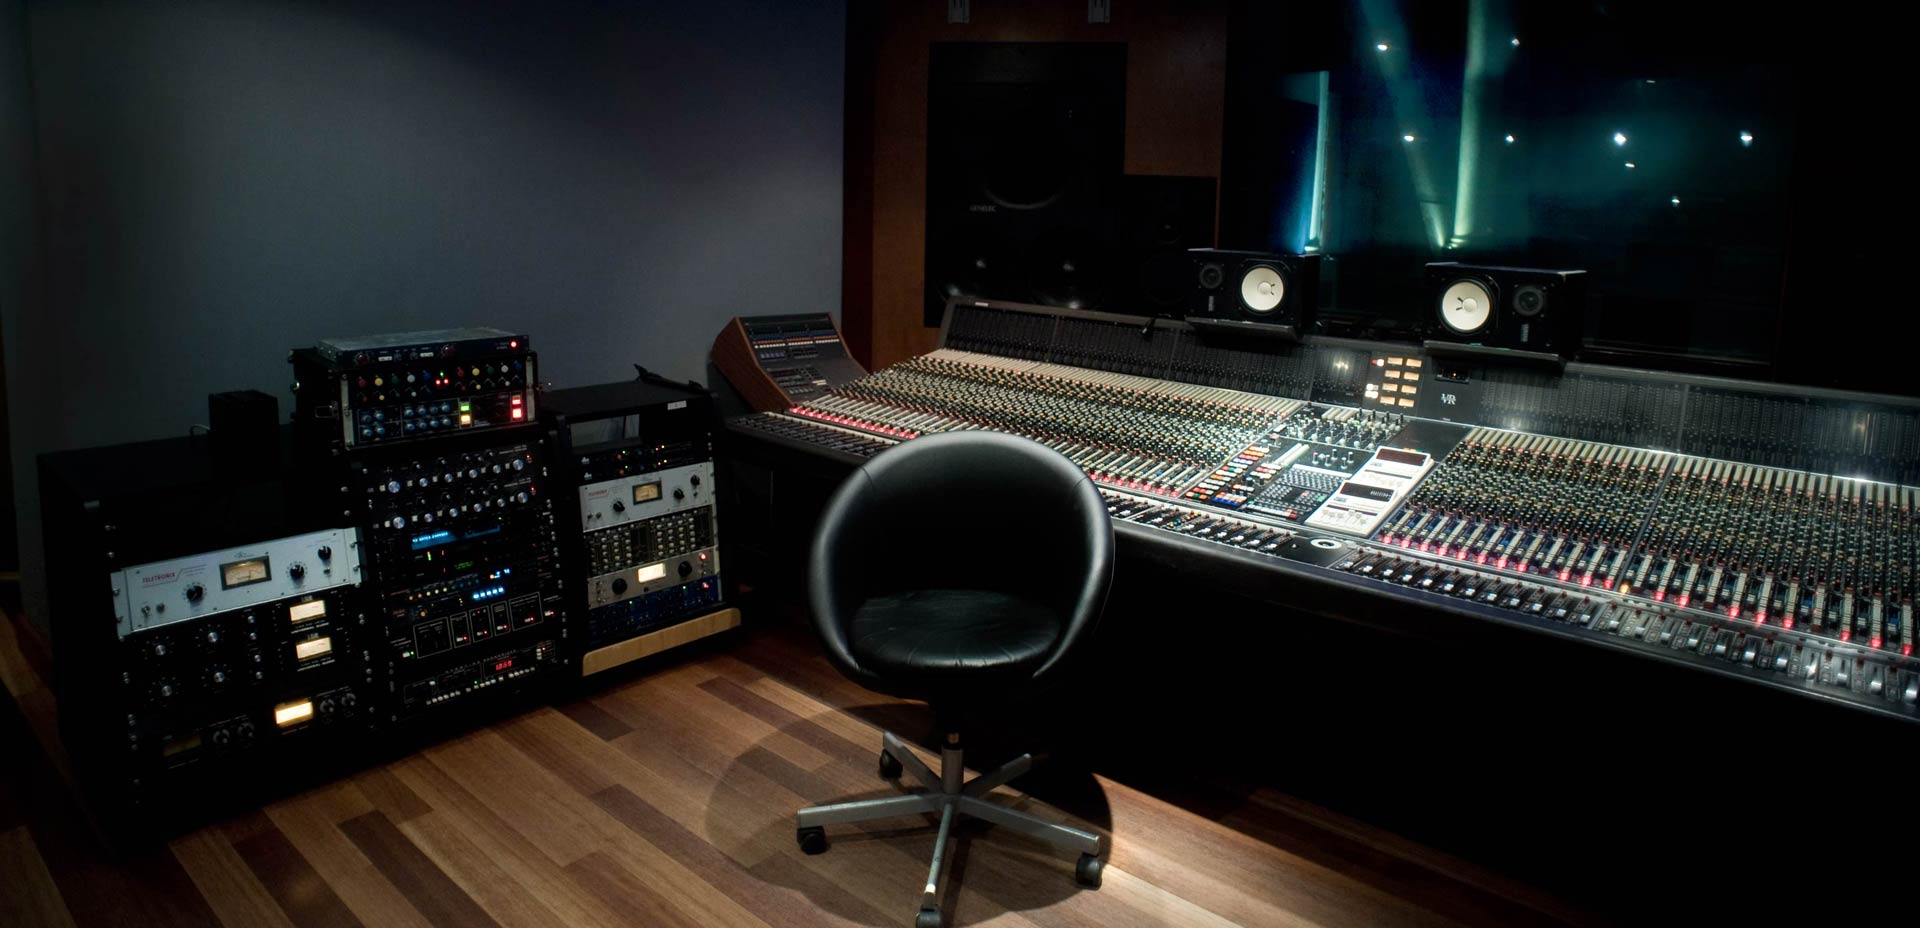 Recording Studio Background Wallpaper Recording stud 1920x928